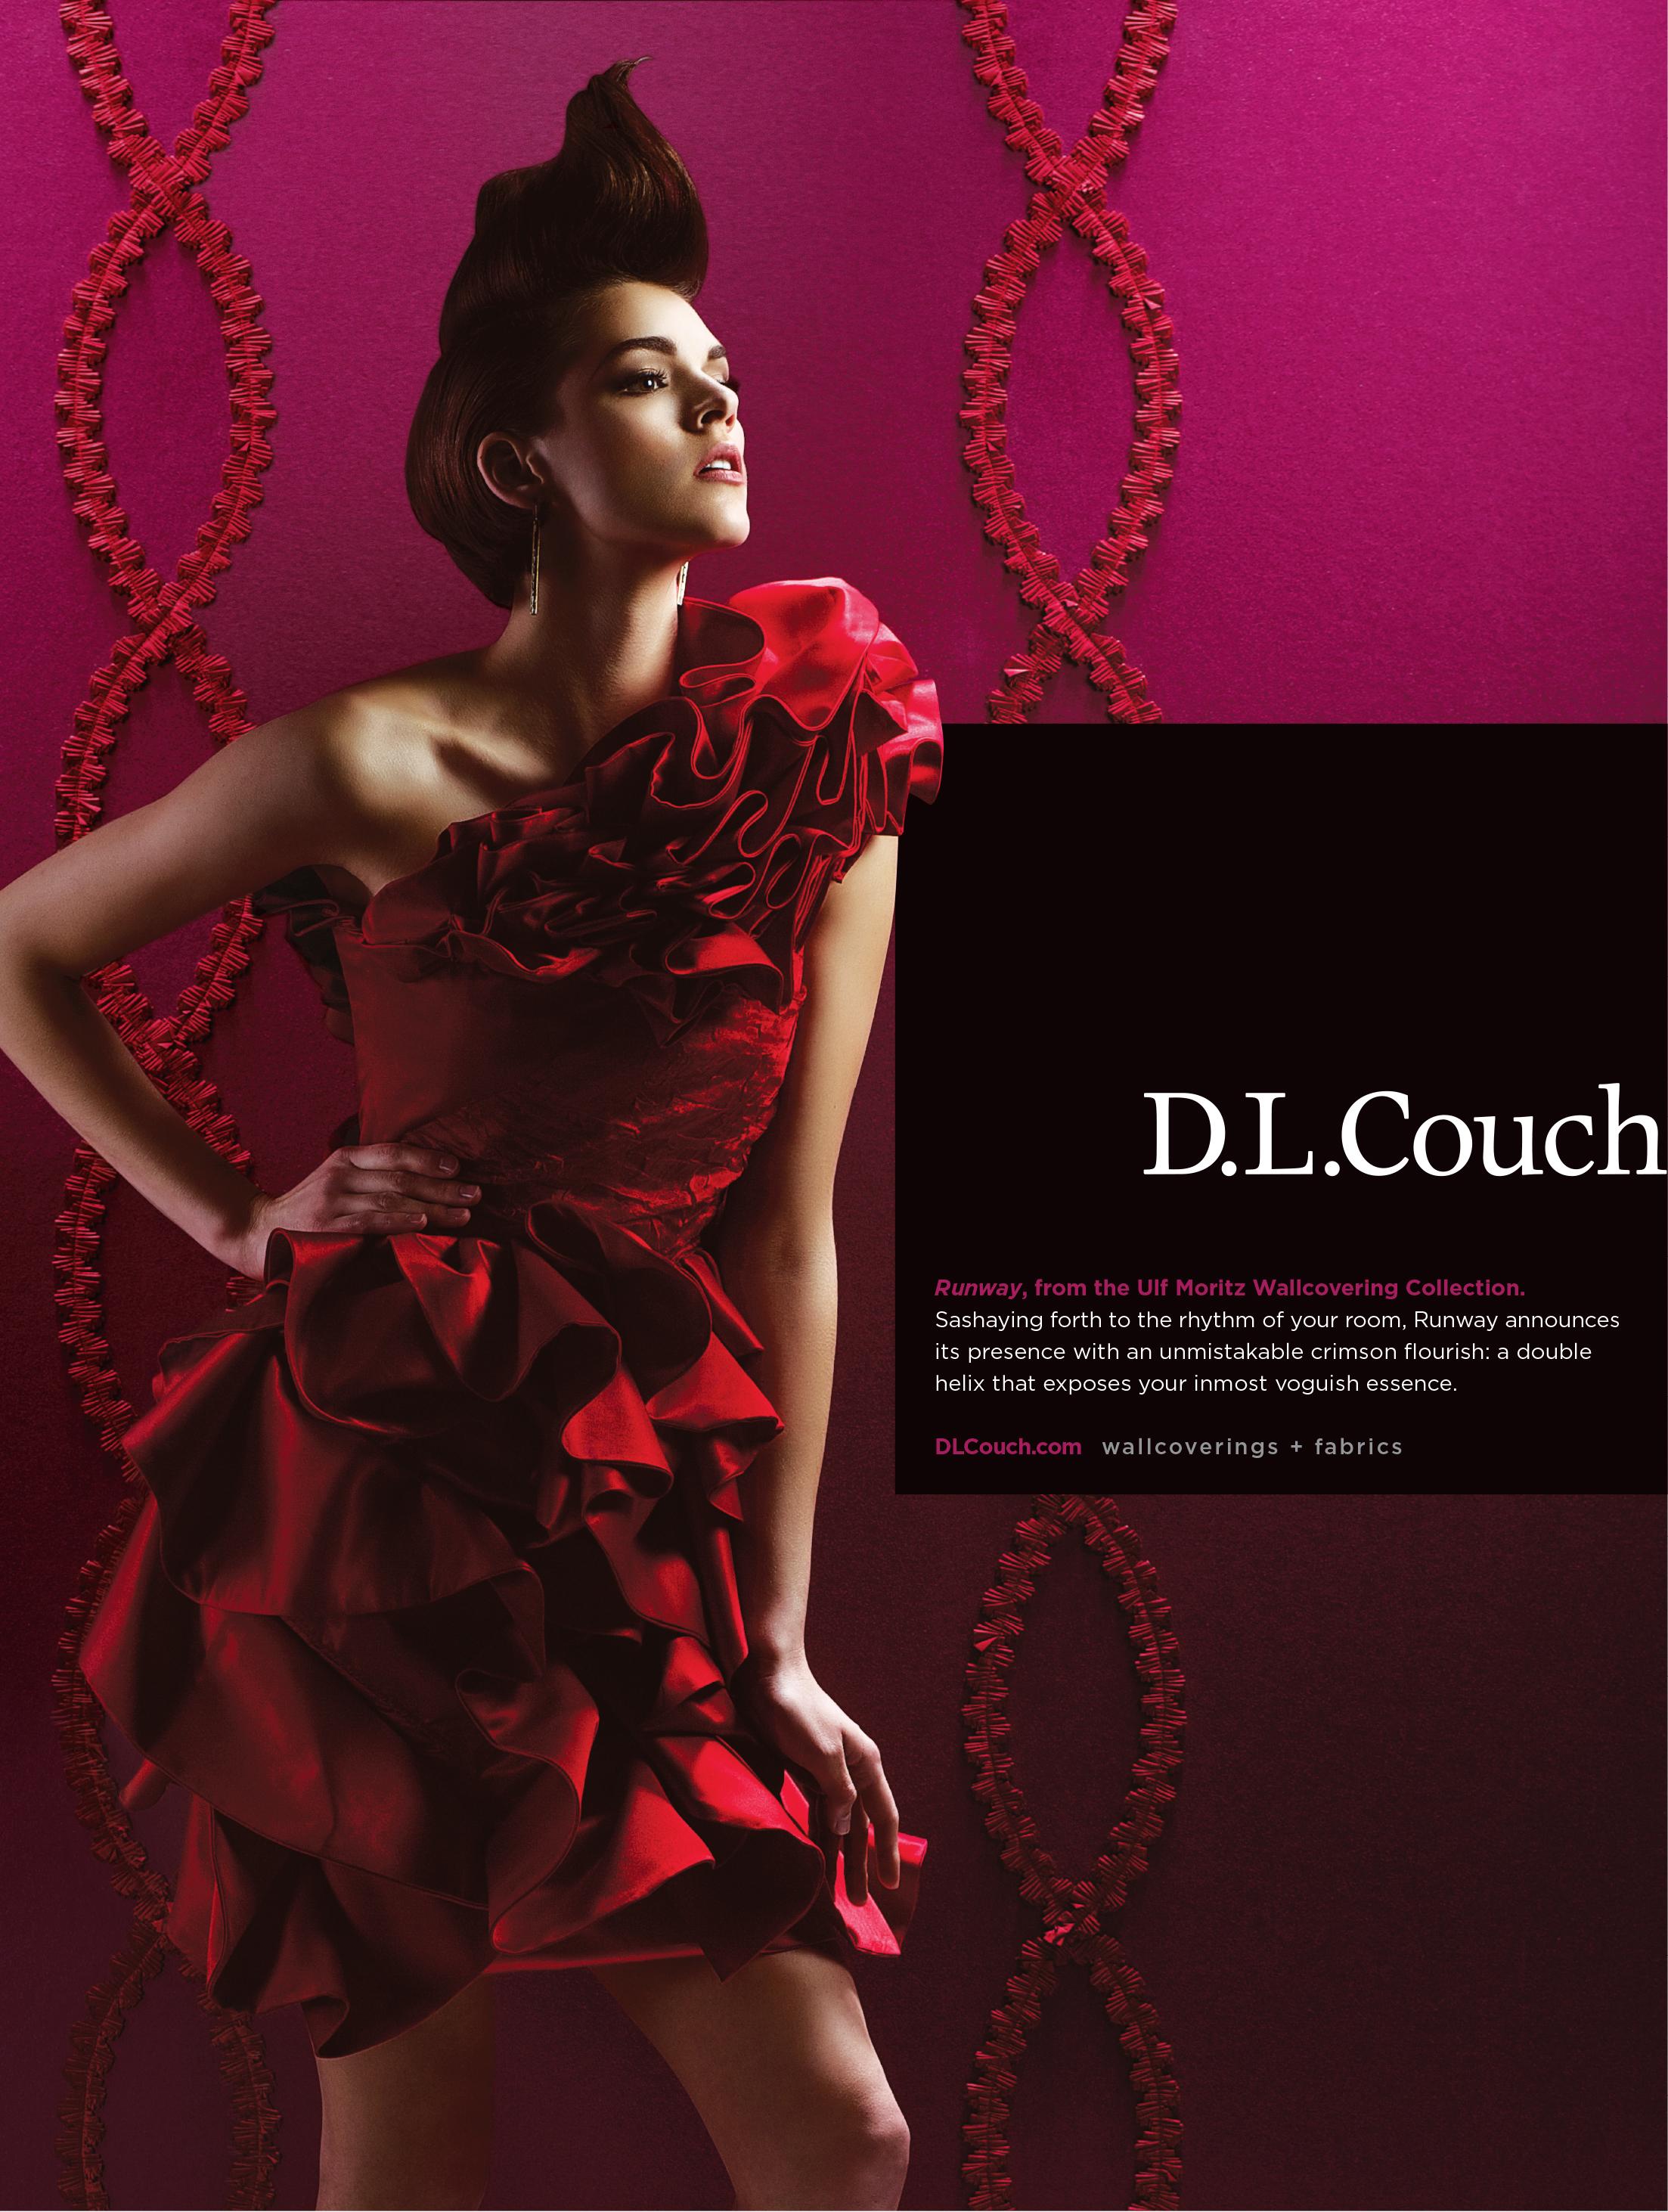 DlCouch-2.jpg